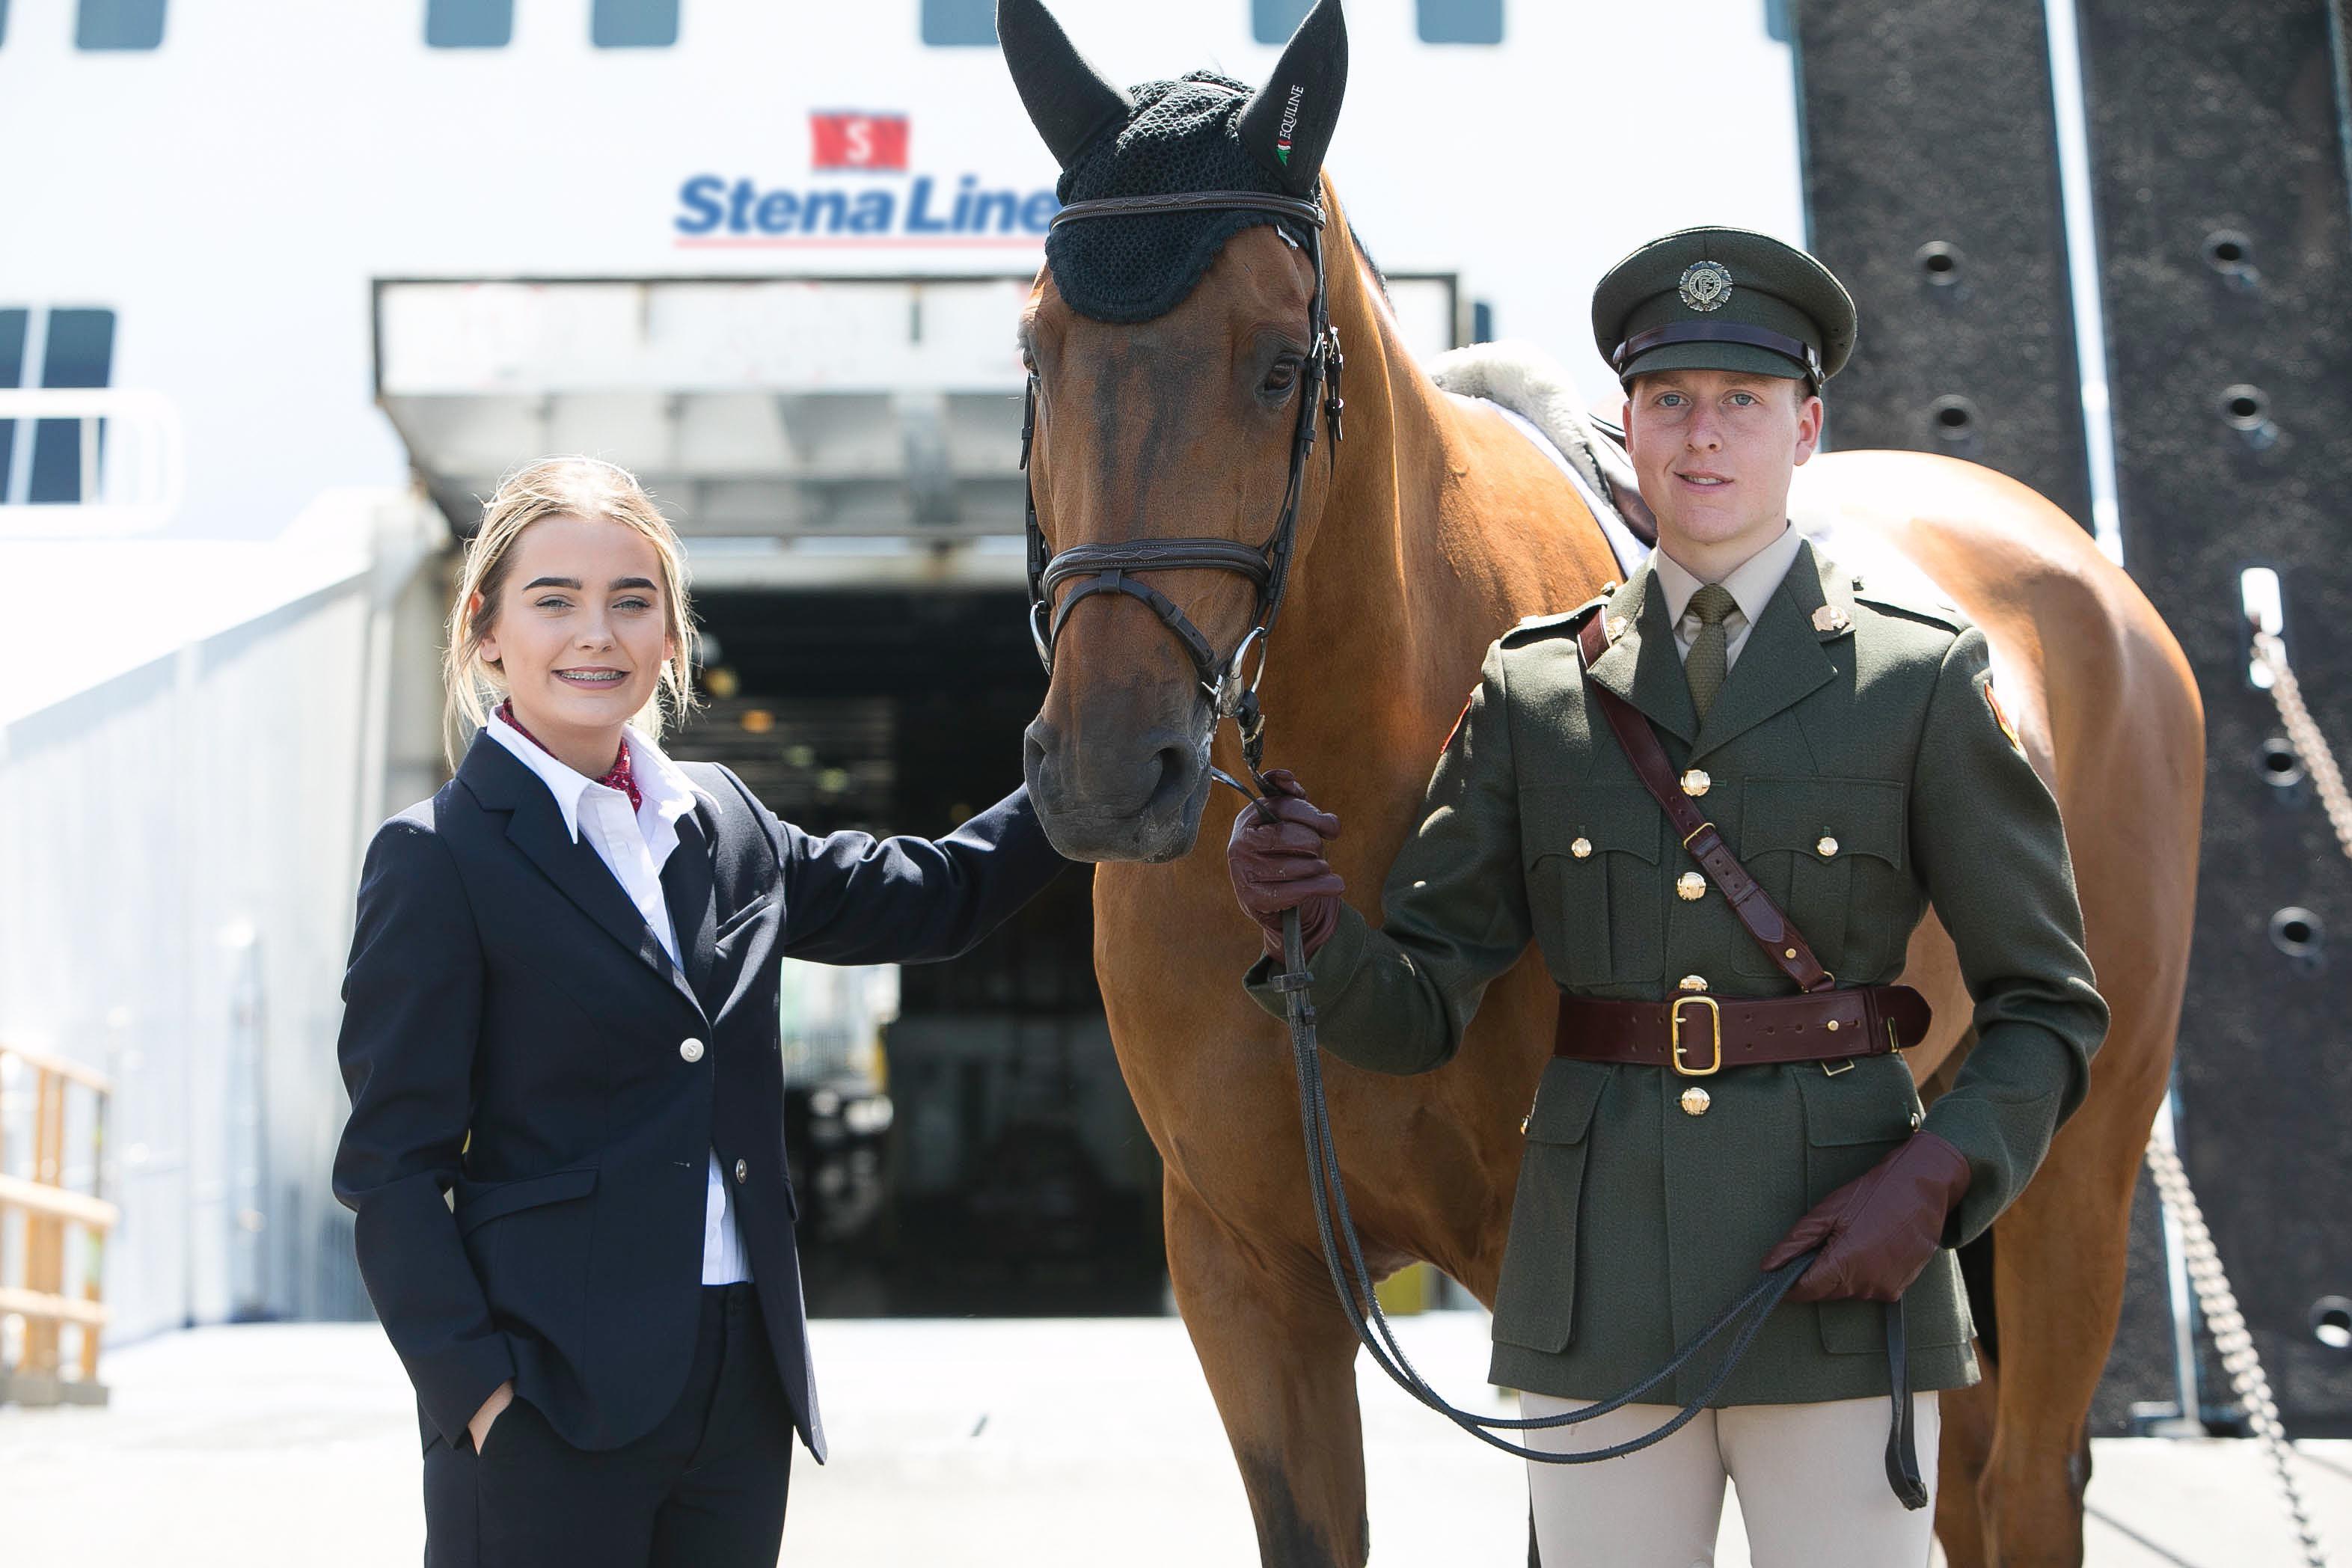 Stena Line - Dublin Horse Show #2